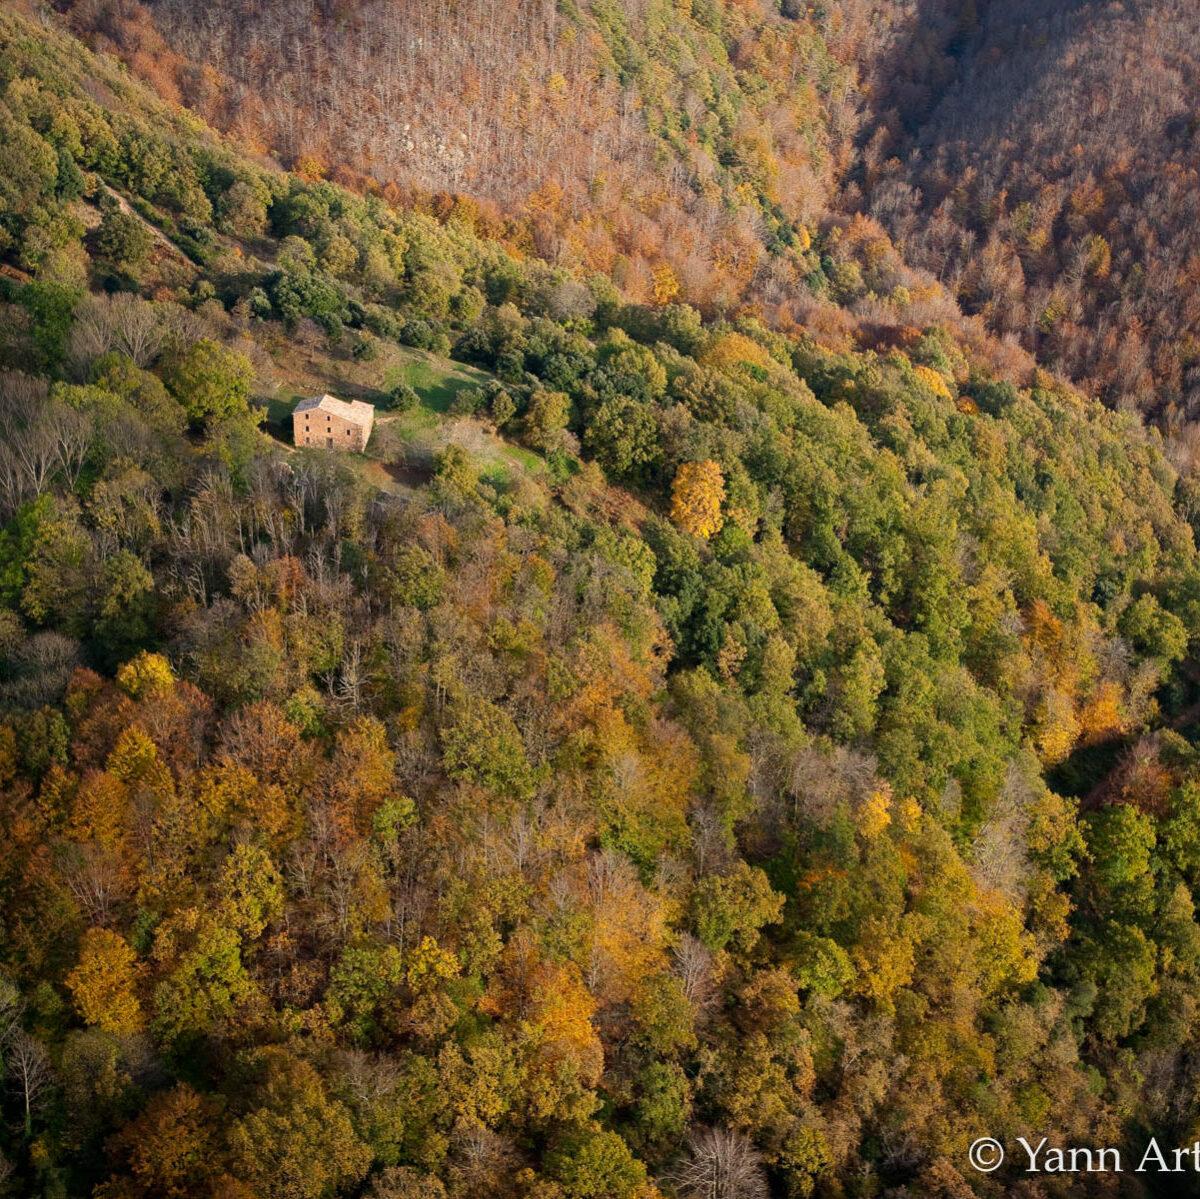 reforestation naturelle forets spontanées